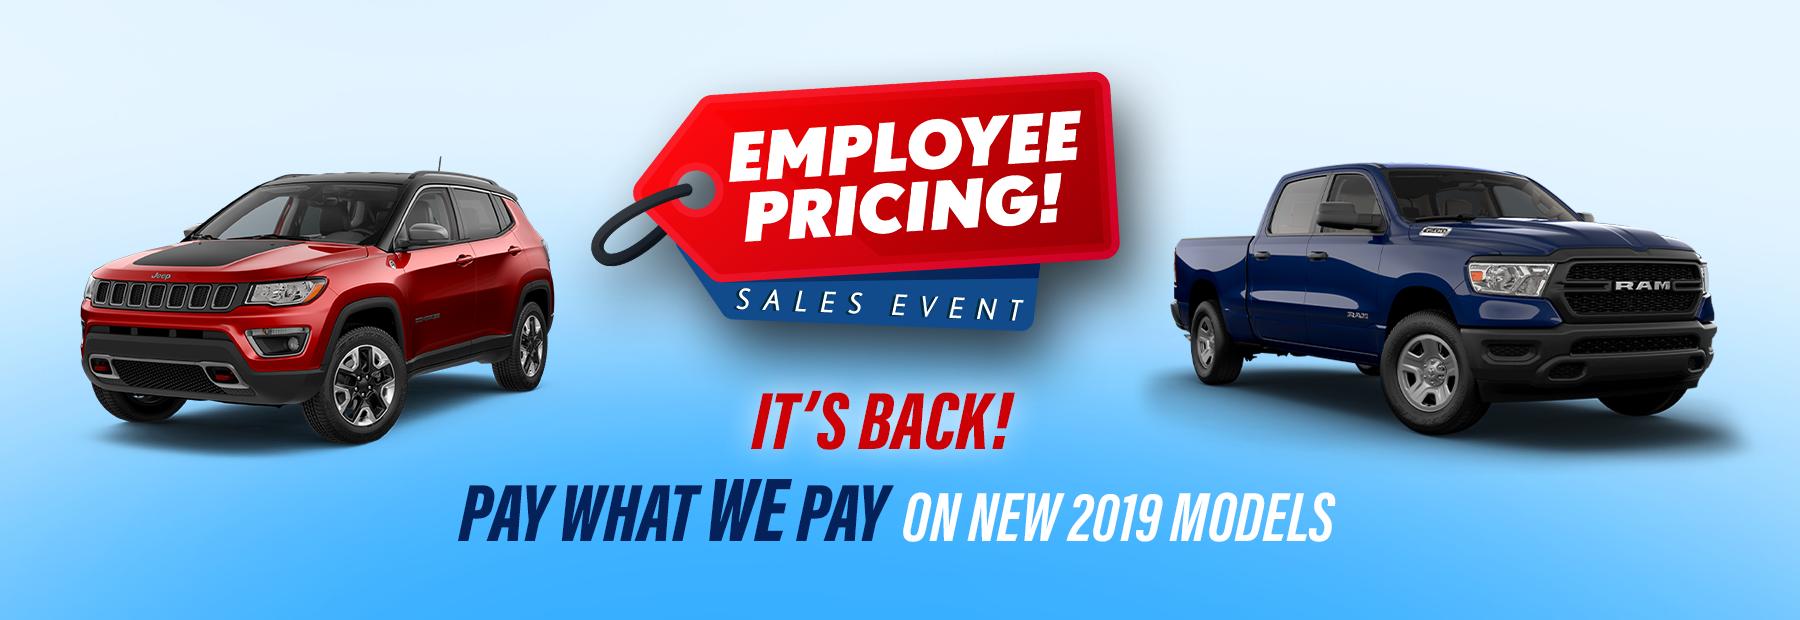 employee-pricing-dayton-ohio